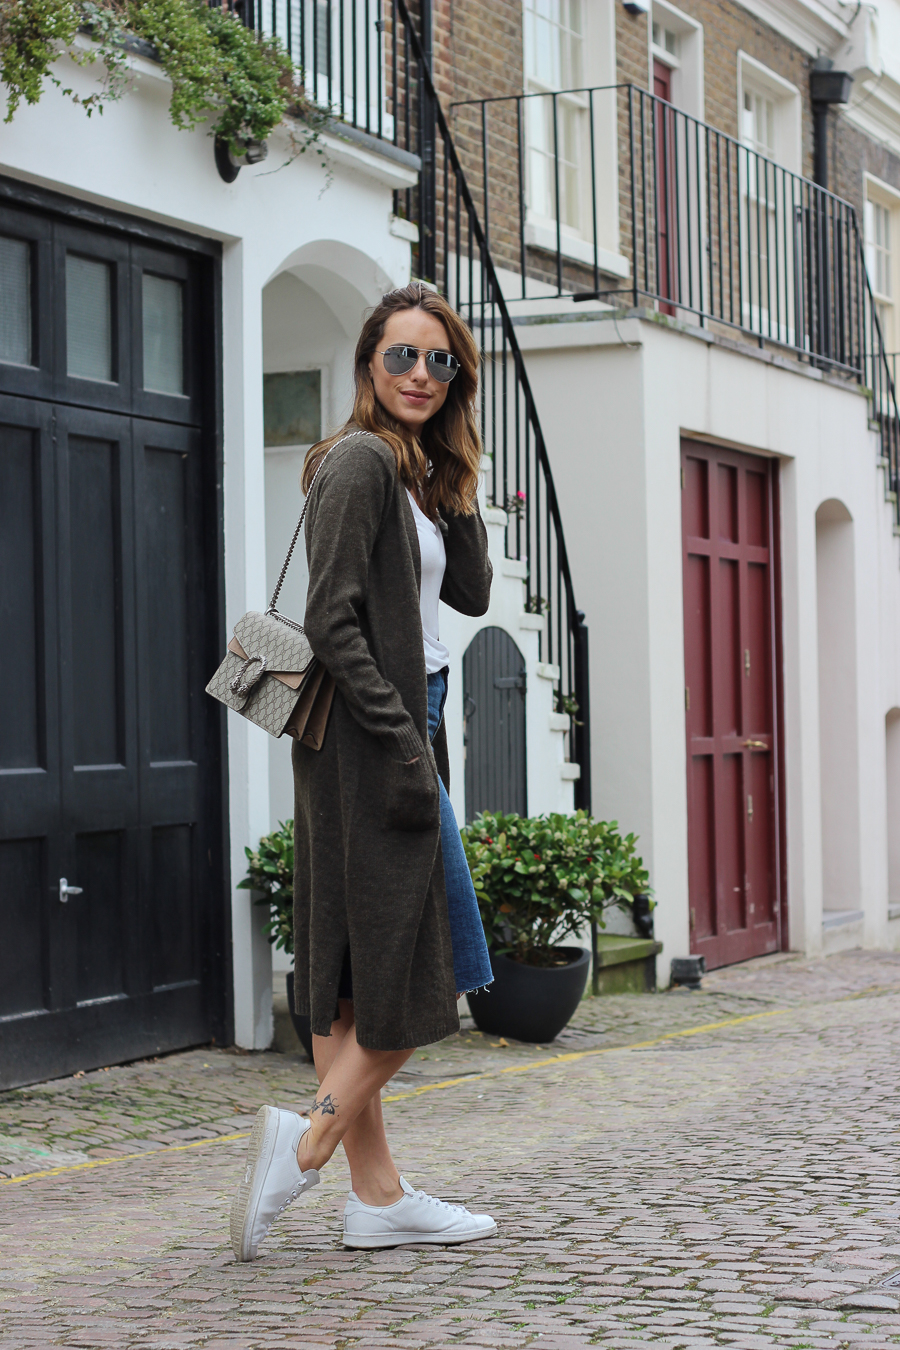 Clutch and carry on - uk fashion blogger - uk travel blogger - sabrina chakici - matalan cardigan, zara denim midi skirt, gucci dionysus supreme-4